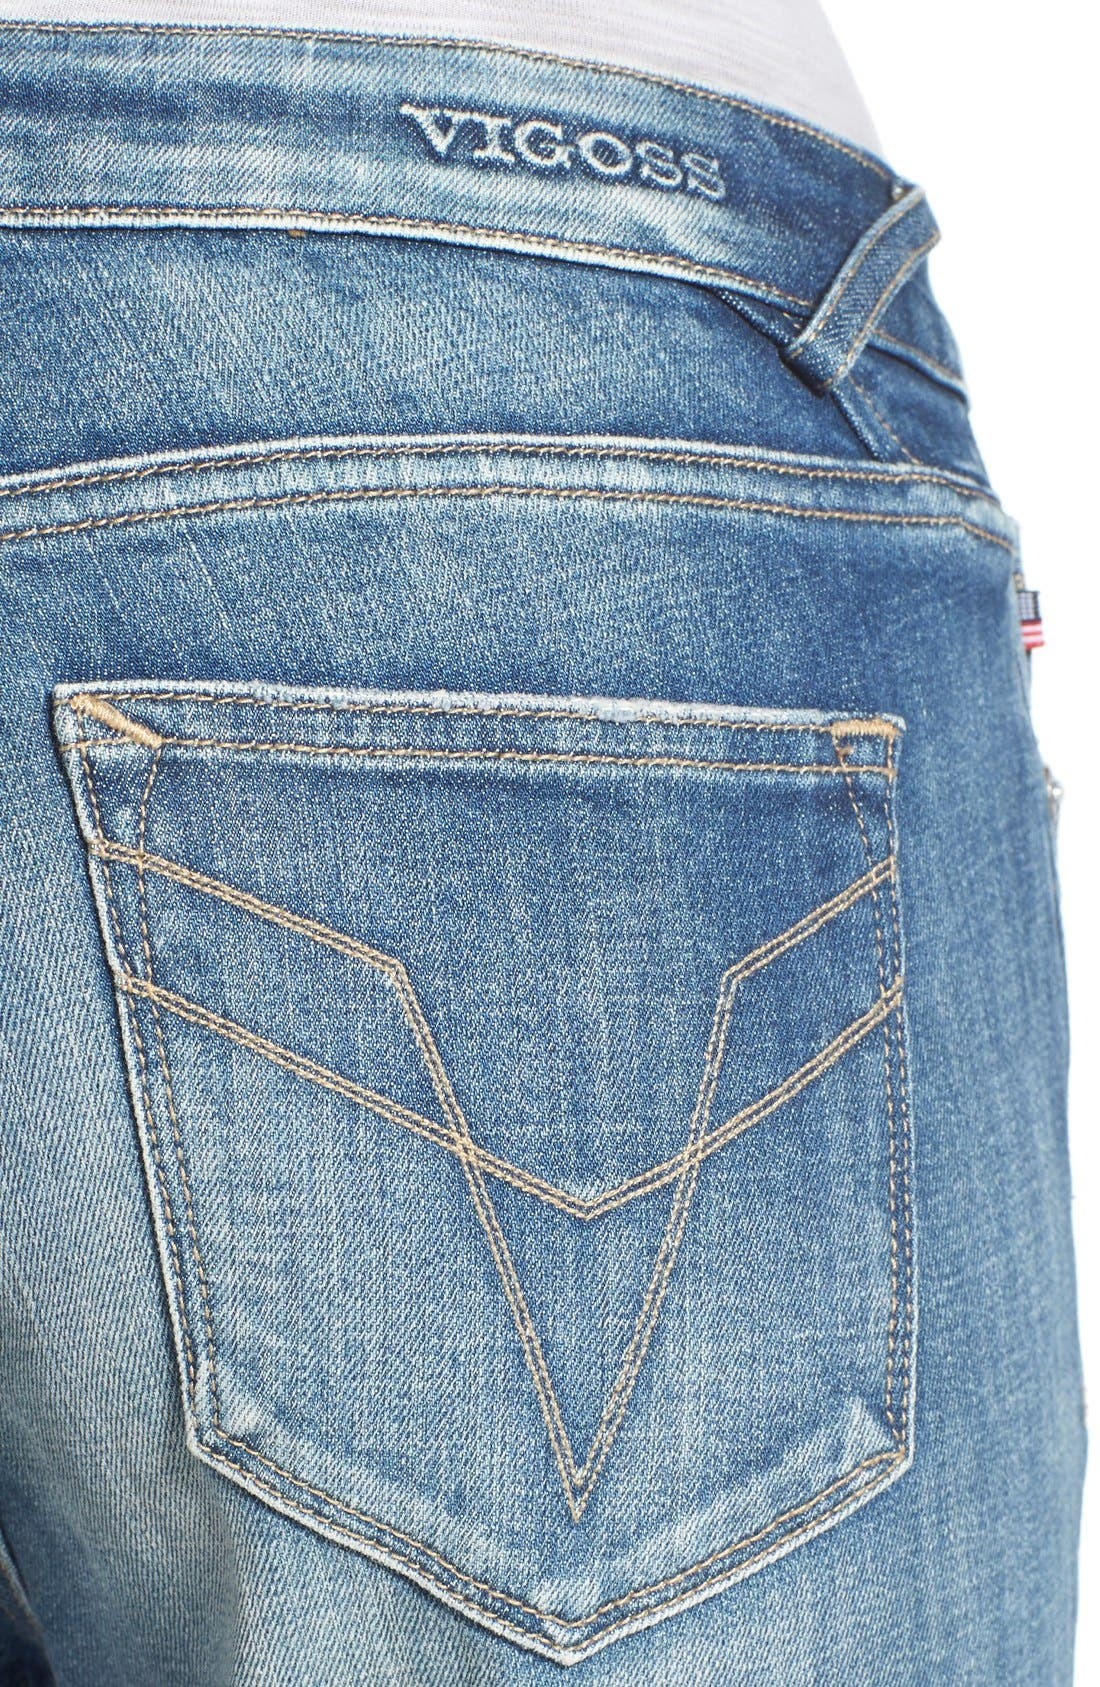 Alternate Image 4  - Vigoss 'Chelsea' Flare Jeans (Medium Wash)